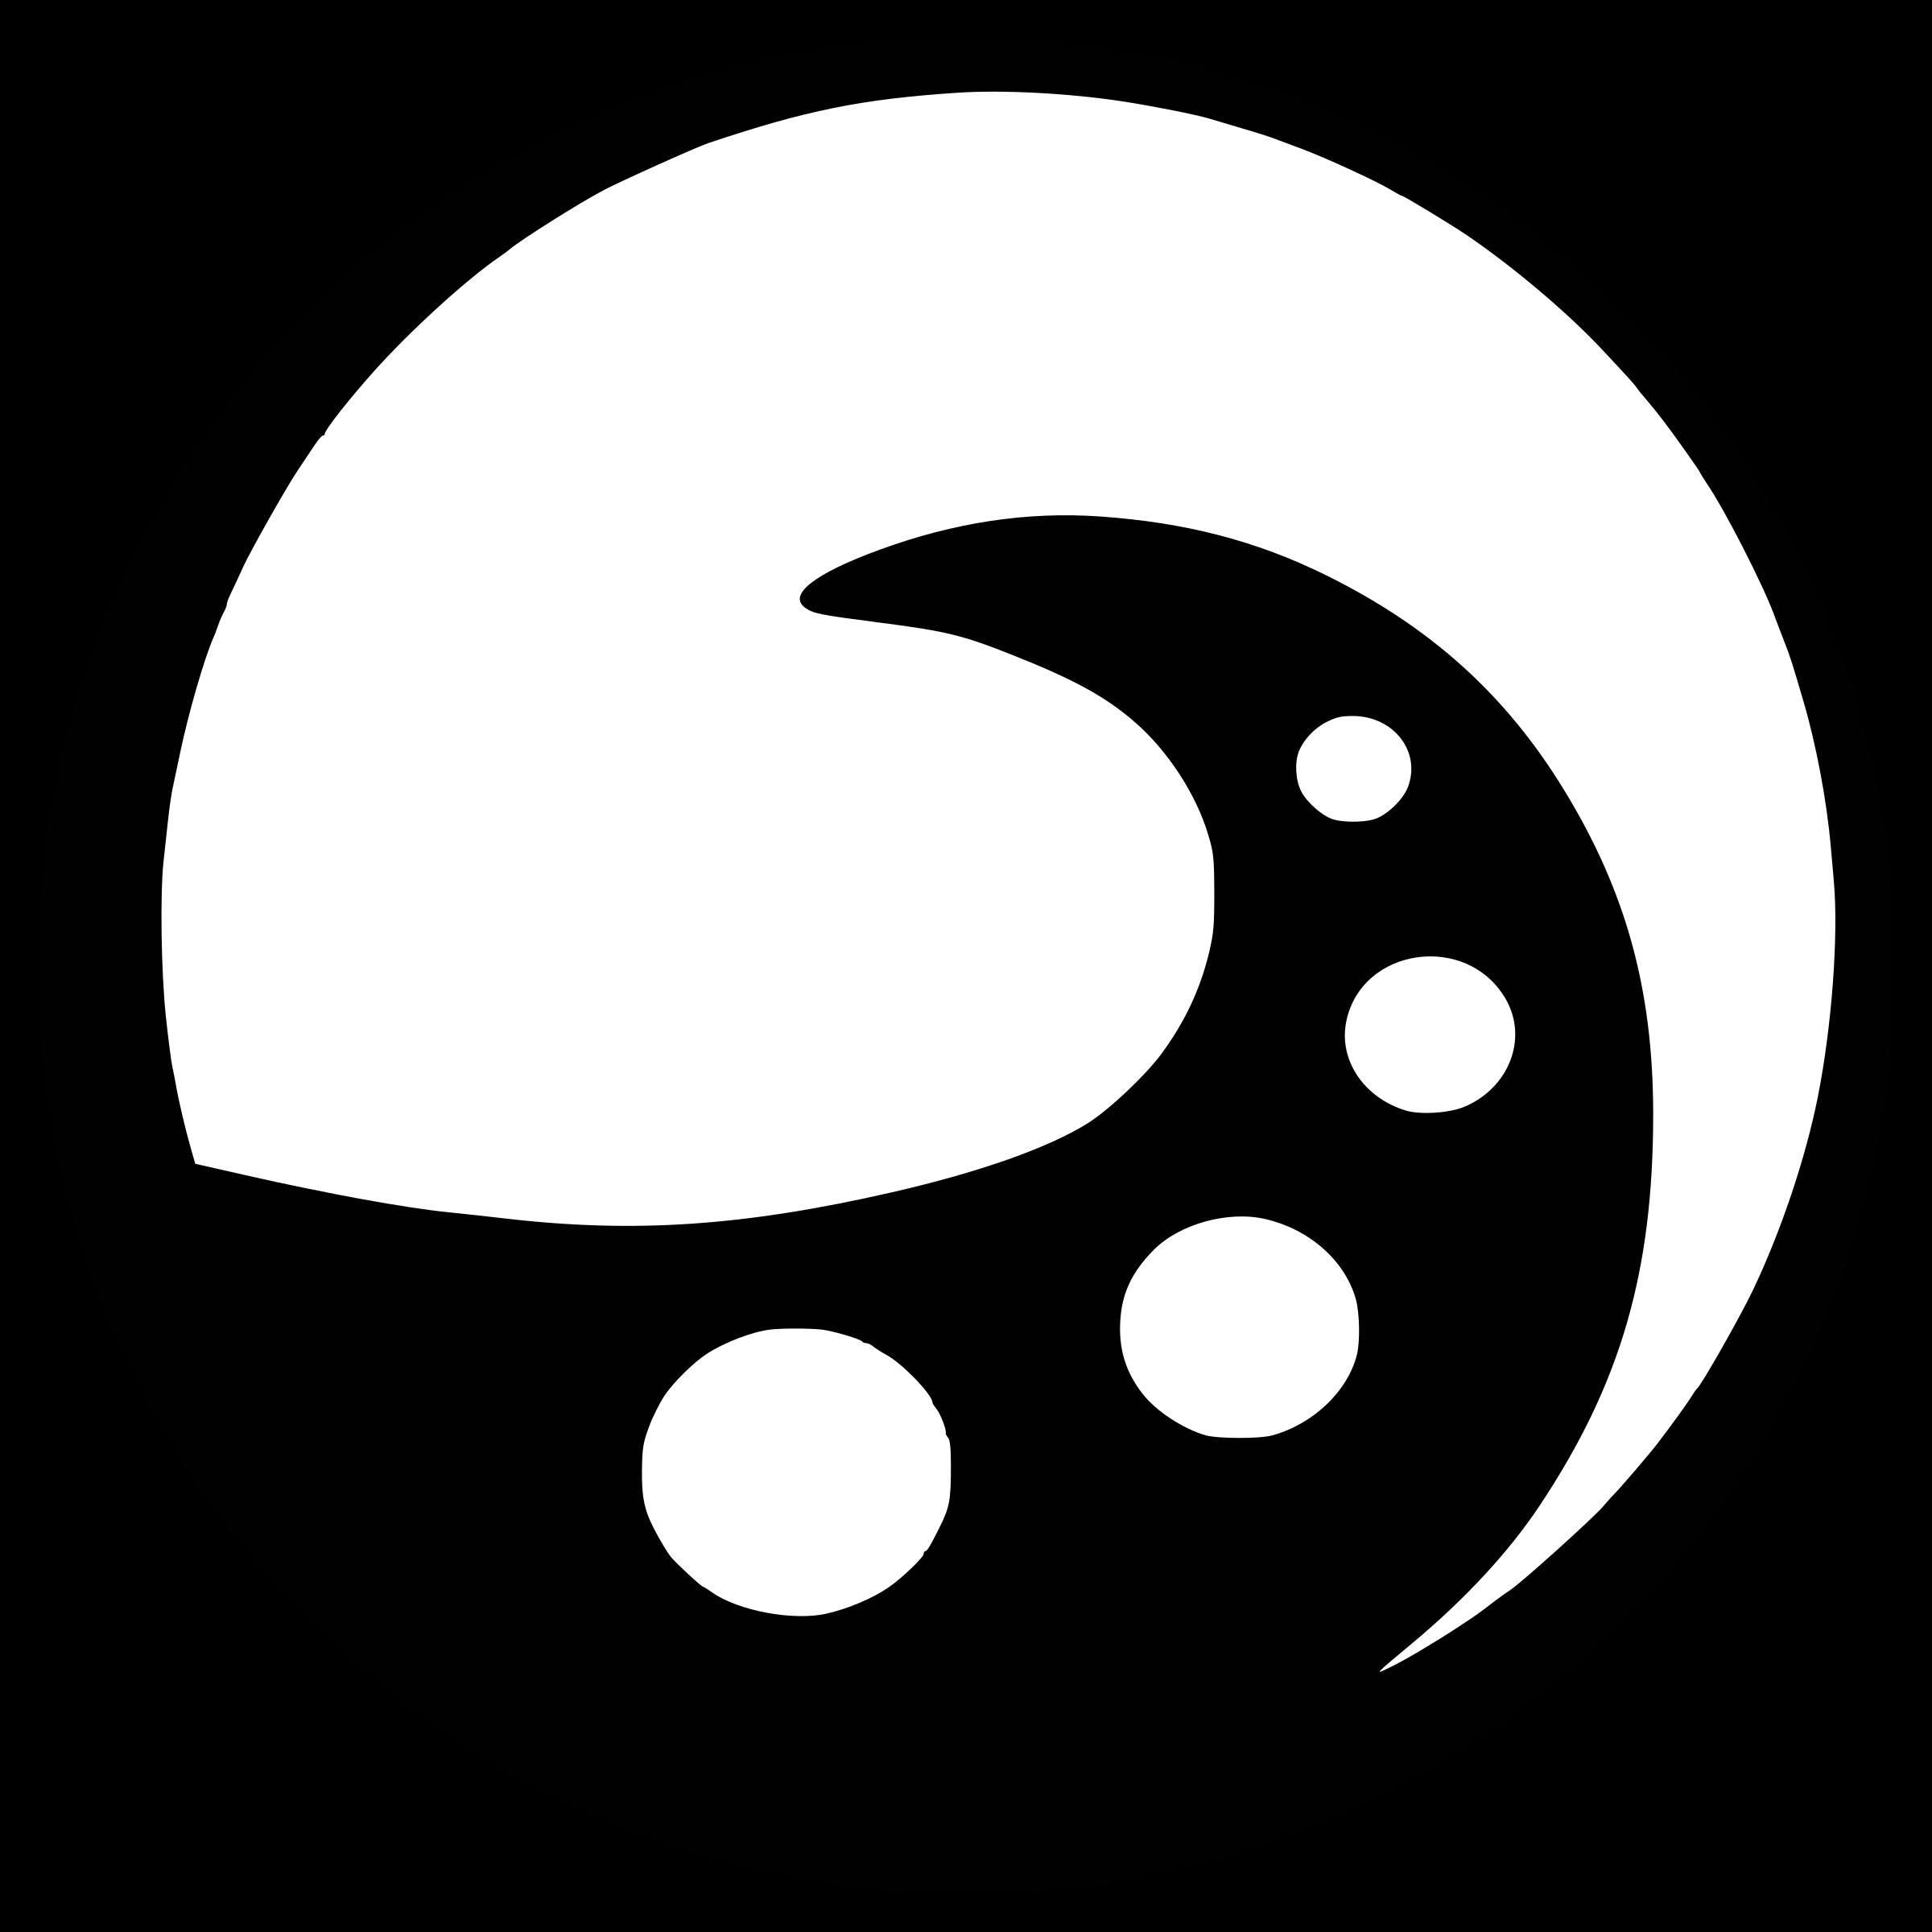 clipart aoki clan symbol